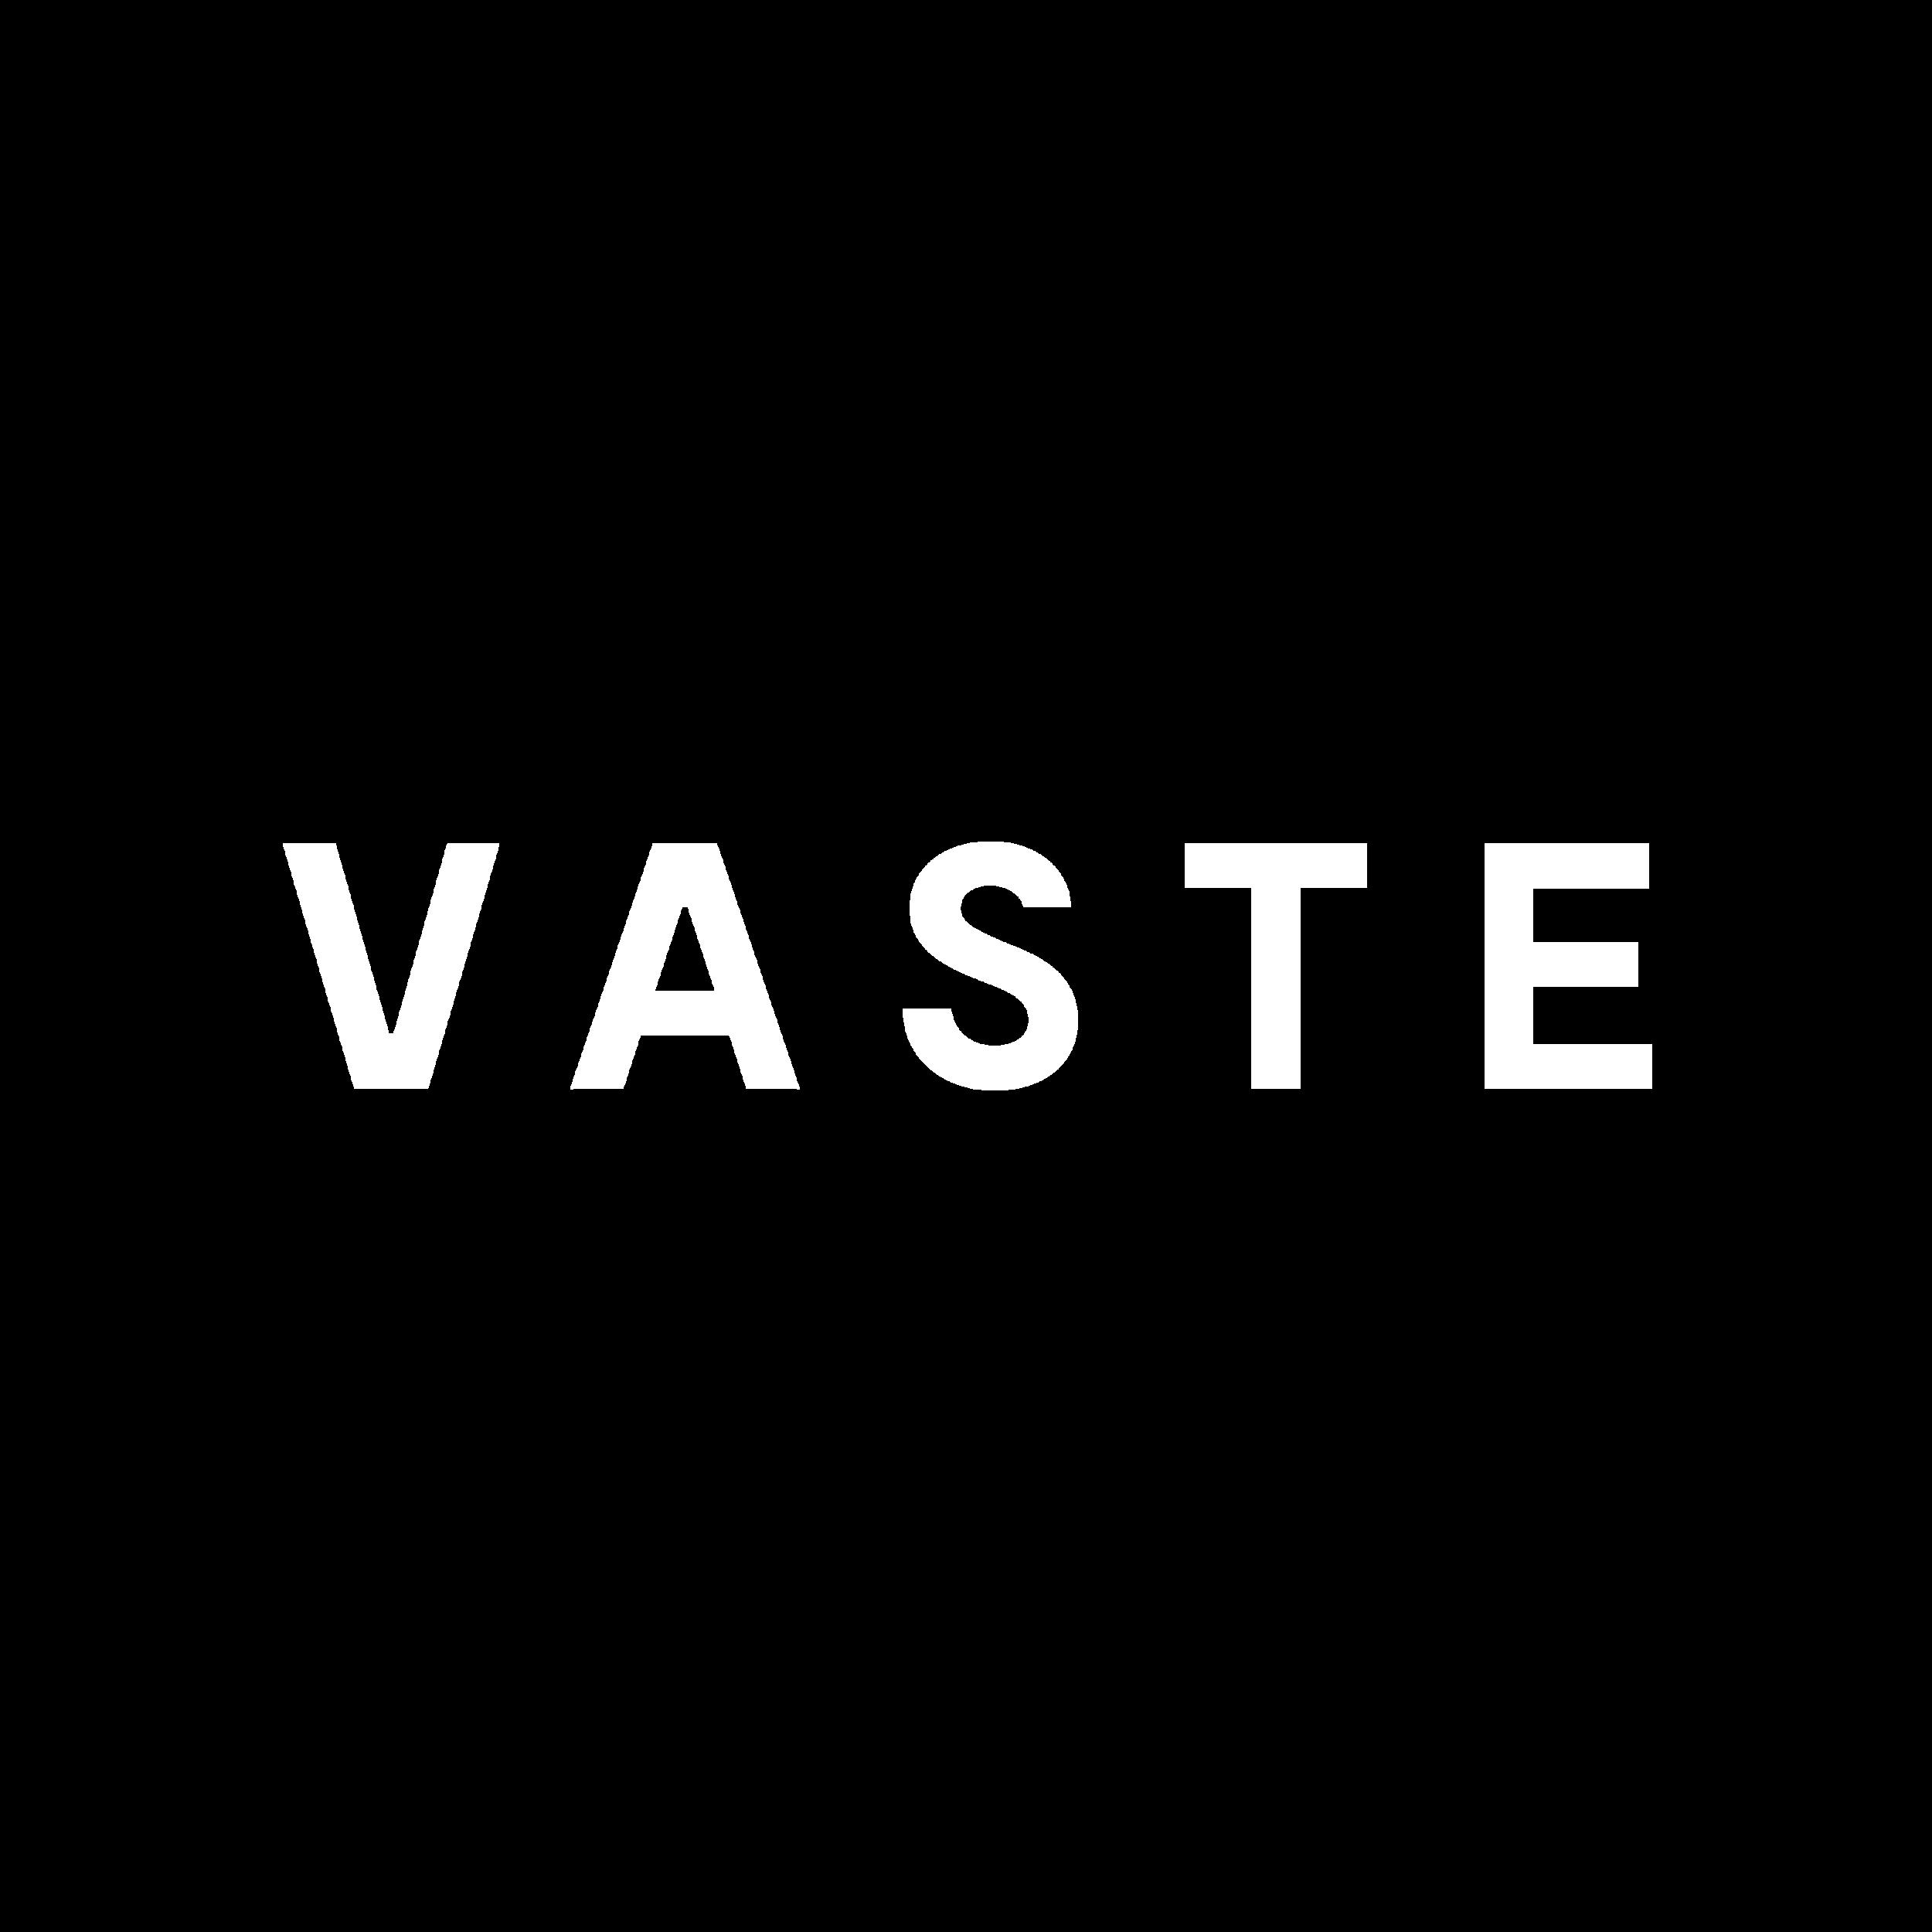 VASTE_logo blanc sans fond.png